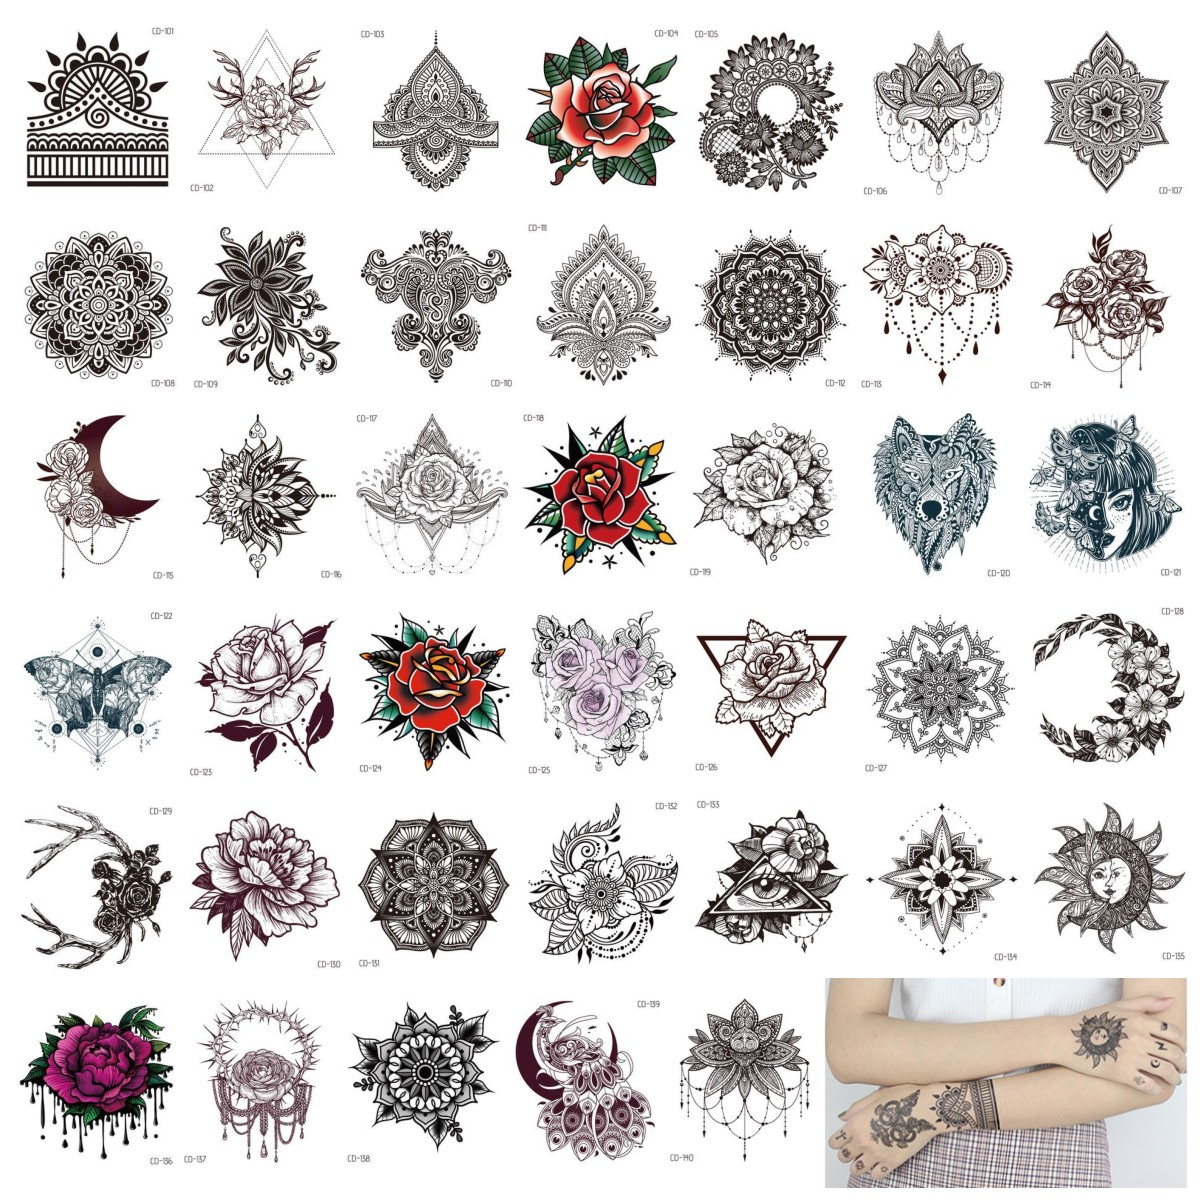 40pcs Henna India Tattoos Sticker Black Temporary Tattoo Paper Mandala Flower Rose Fake Tatto Stickers Hand Arm Foot Body Art